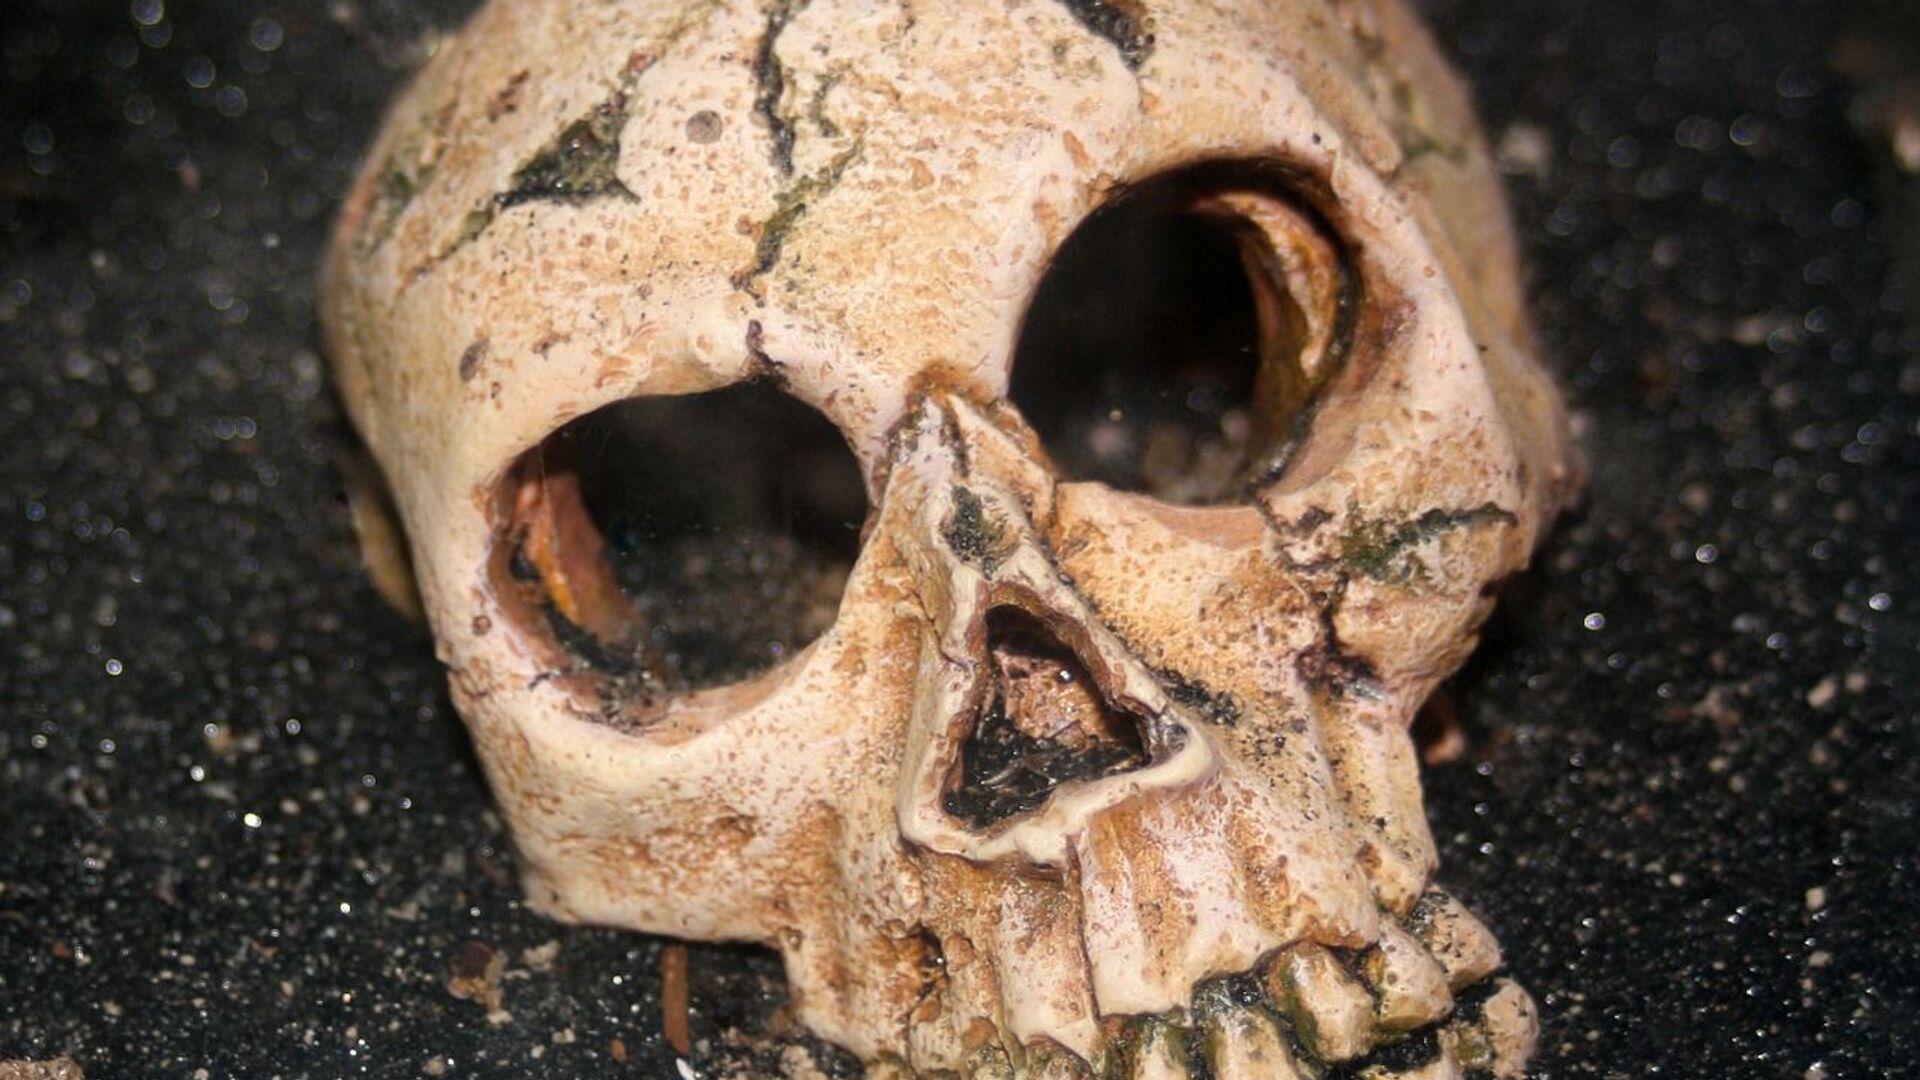 Cráneo humano (imagen referencial) - Sputnik Mundo, 1920, 12.03.2021